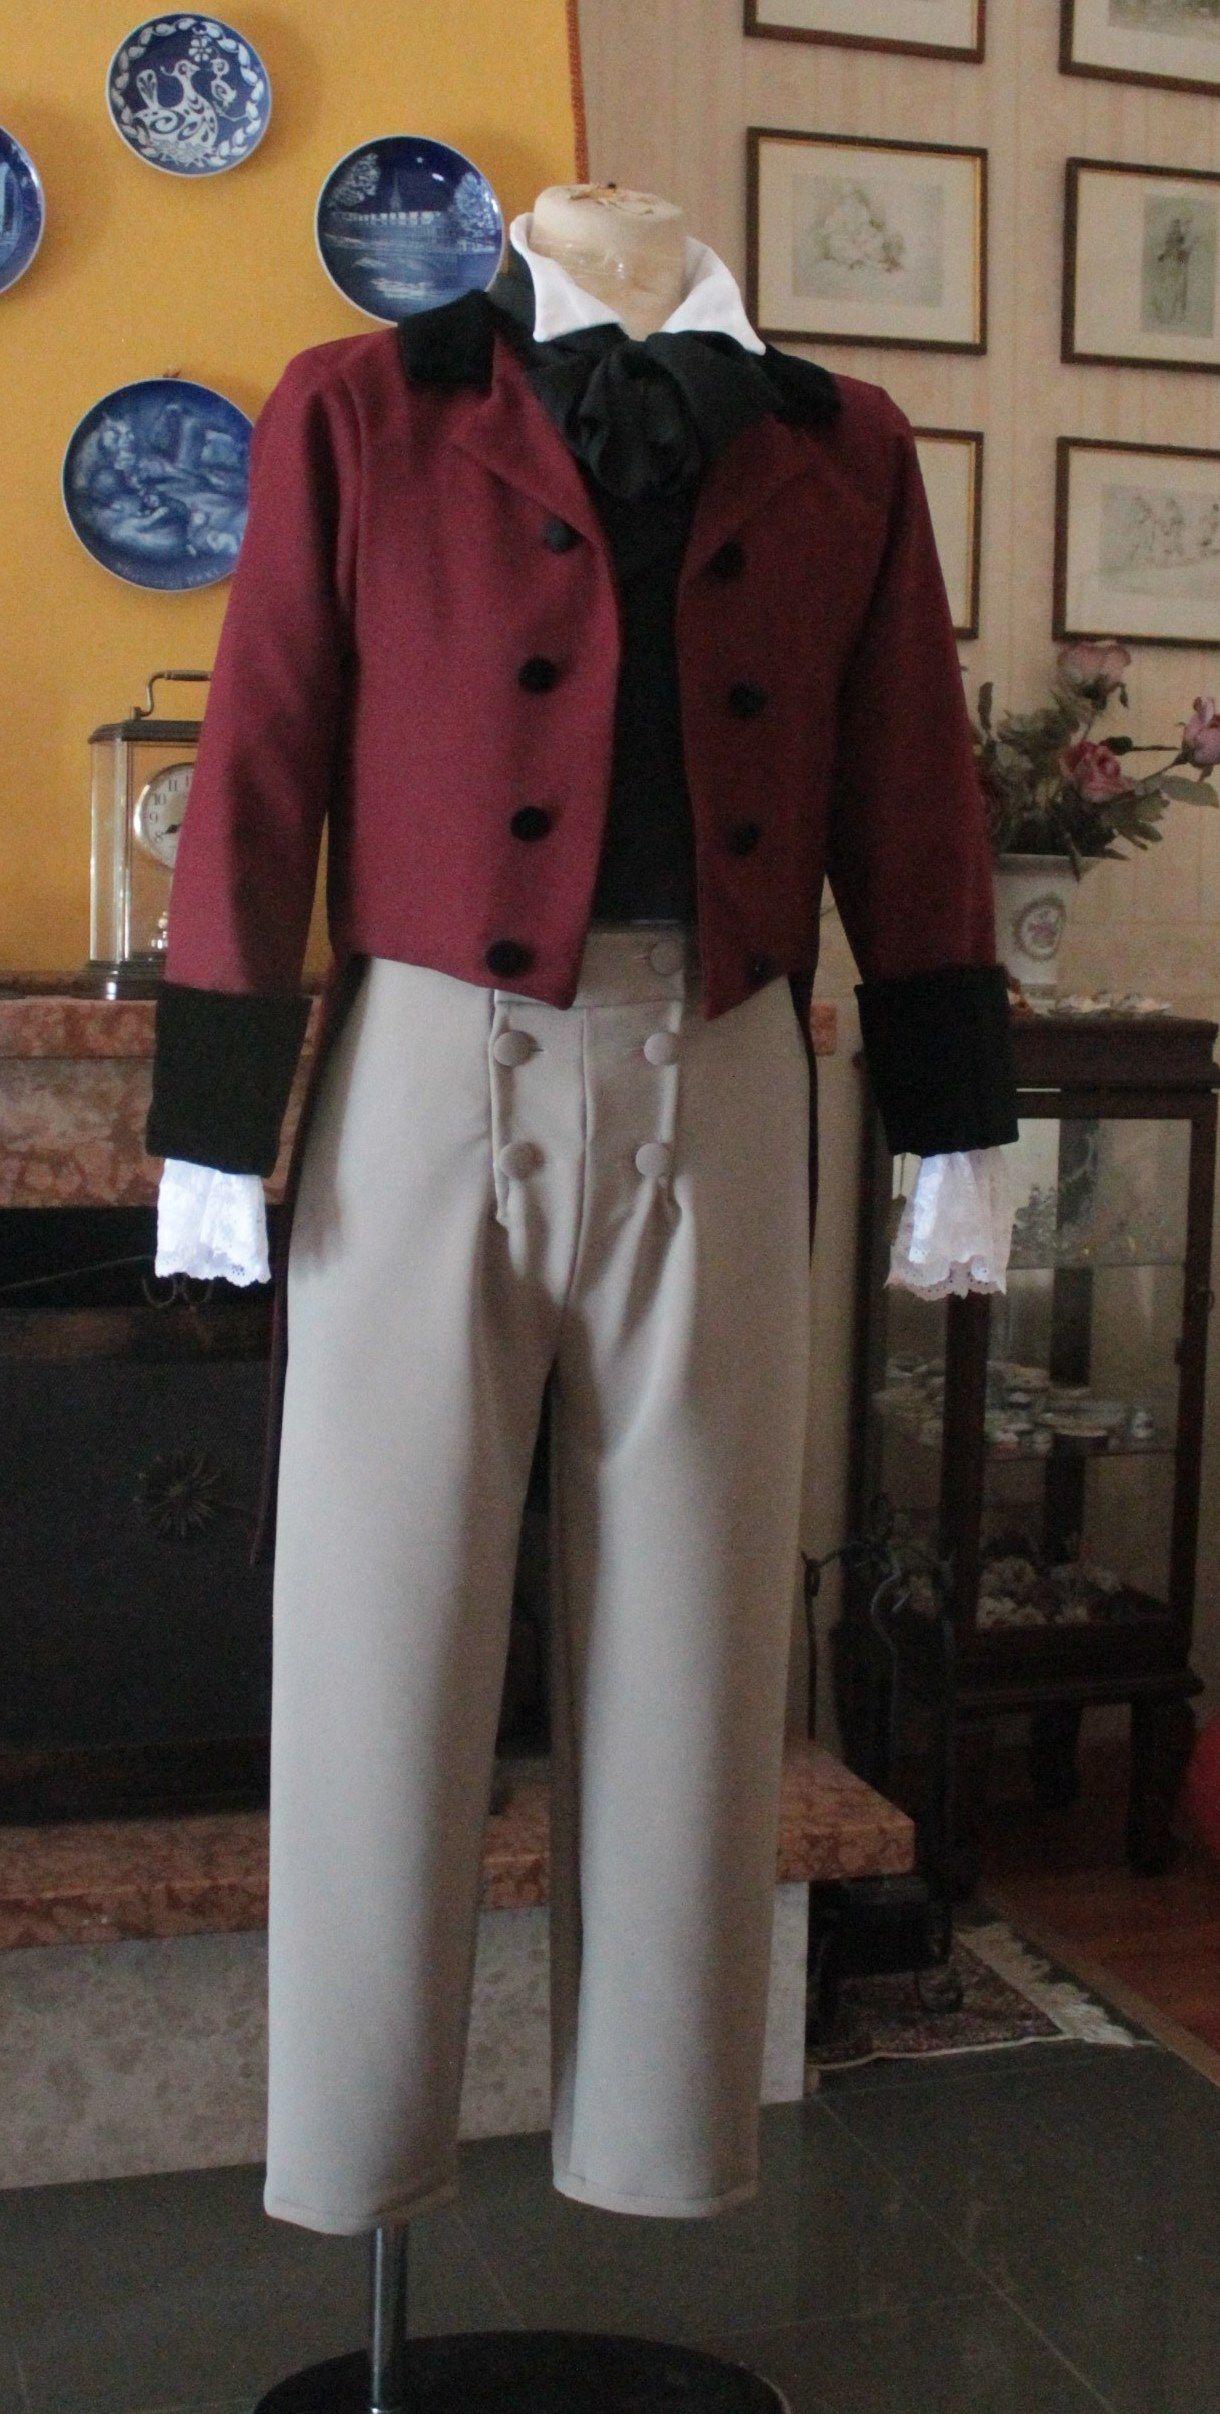 Abito storico periodo Regency 1800-1830